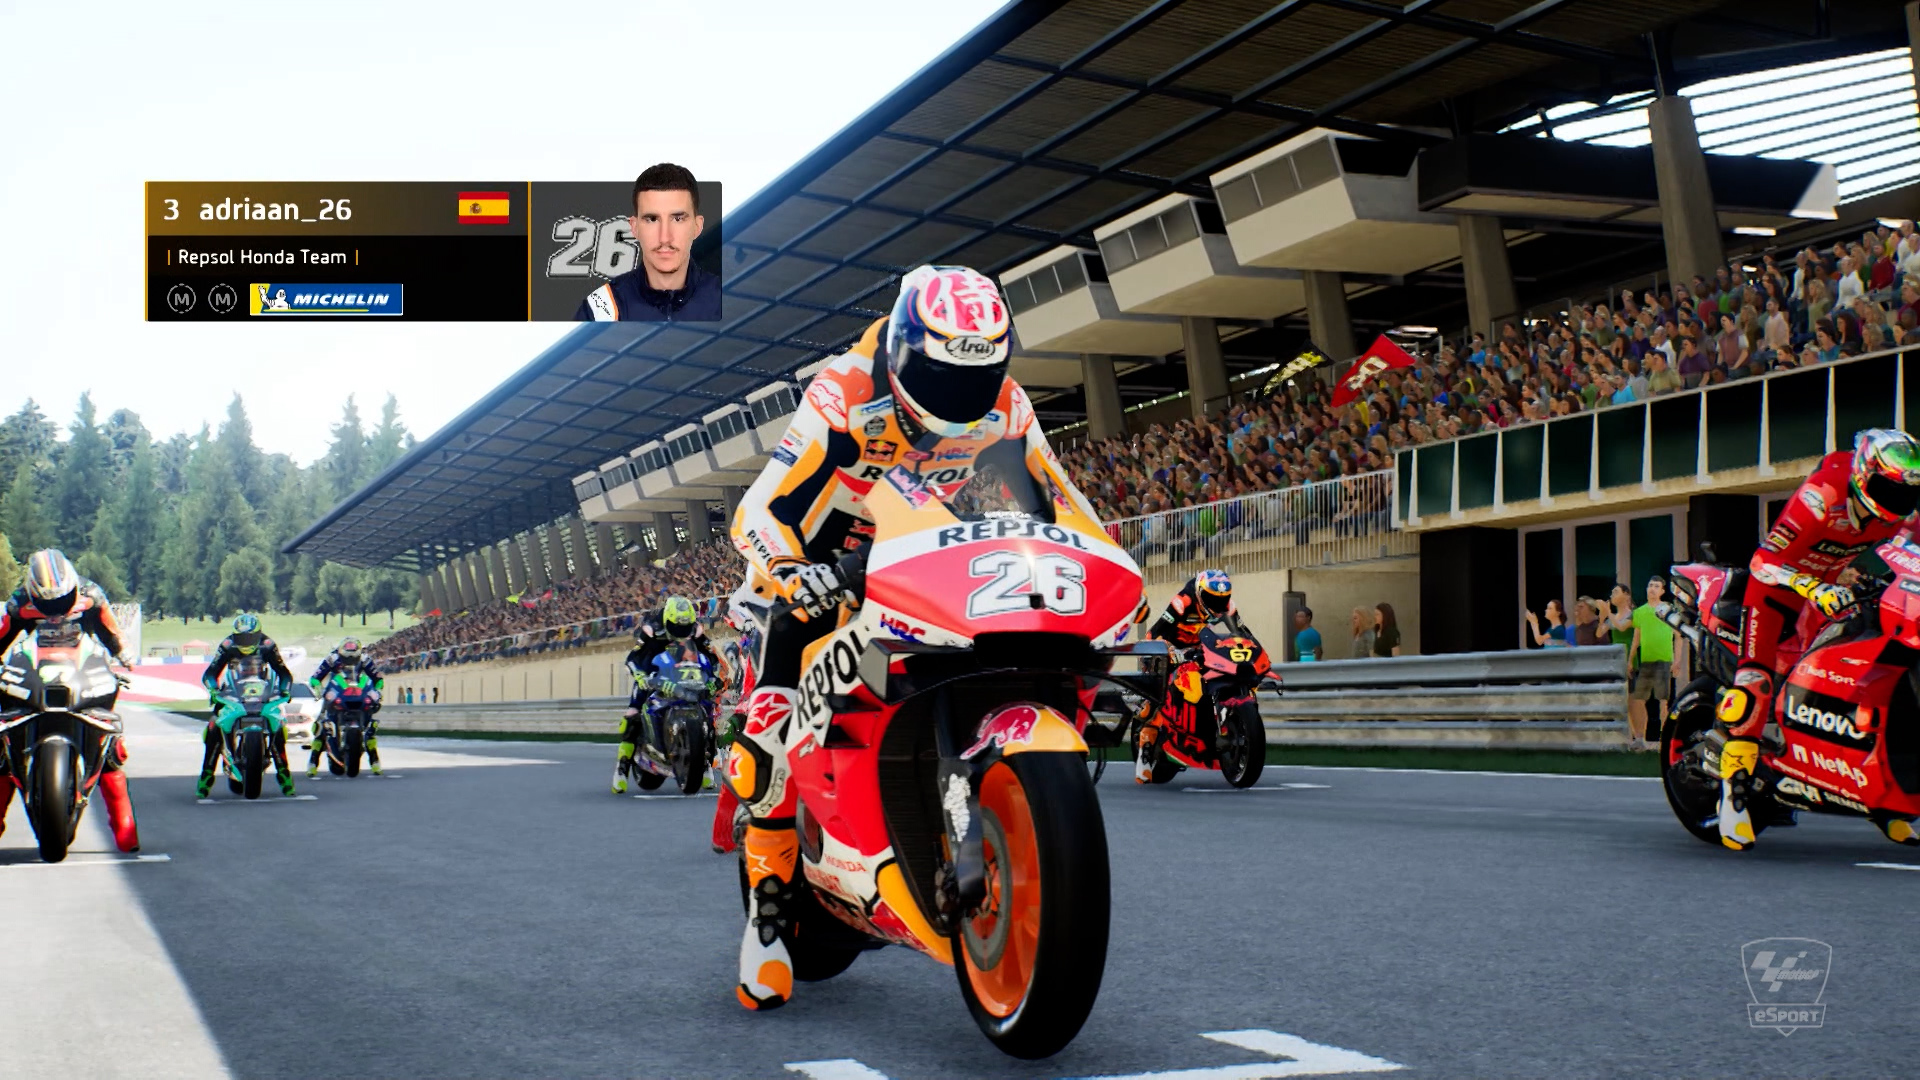 Important points haul for defending MotoGP eSports Champion